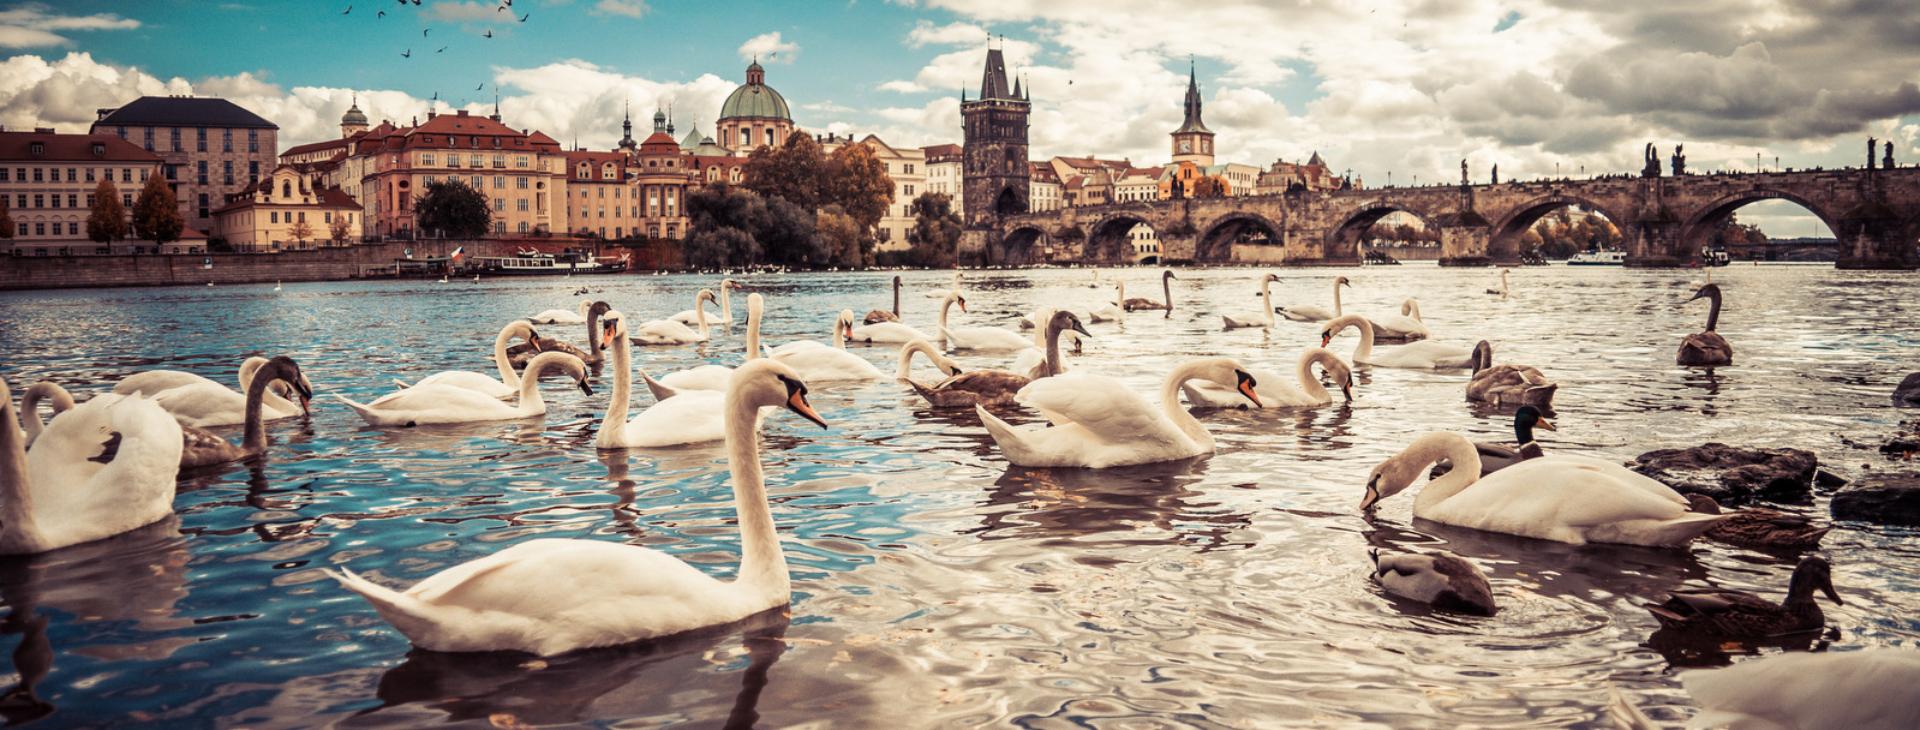 white-swans-near-charles-bridge-in-prague-picjumbo-com-001